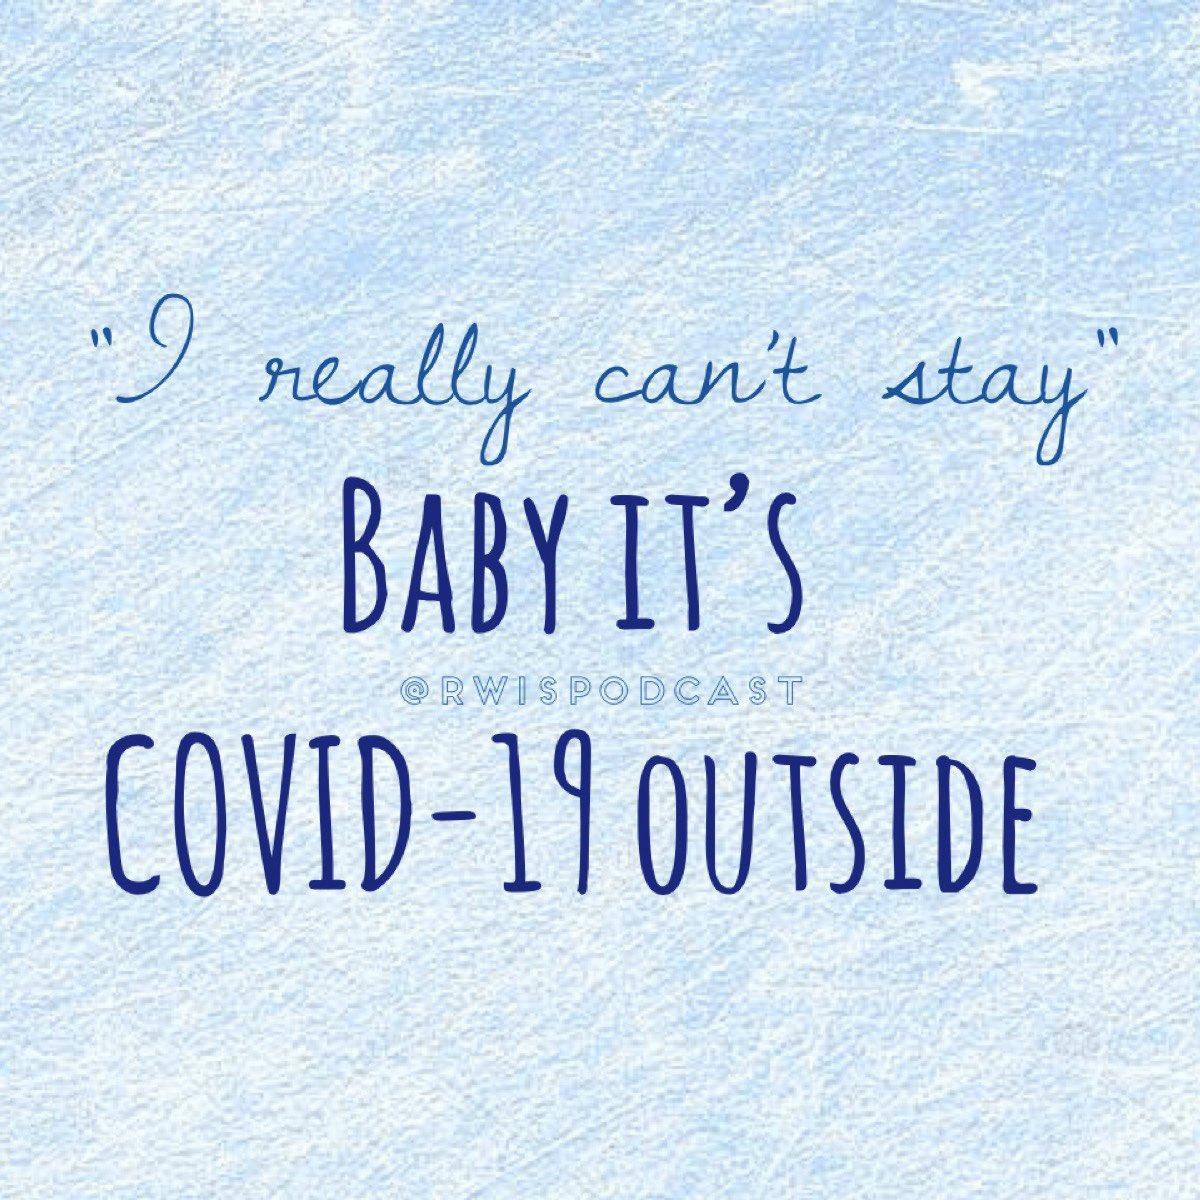 You gotta stay away#babyitscoldoutside #babyitscovidoutside #washyourhands #covıd19  #reasonswhyimsingle #RWISpodcast #podcast #detroit #podcastdetroit #detroitpodcast #comedypodcast #datingpodcast #imsingle #whyimsingle #checkusoutpic.twitter.com/yg9ooP4PVu